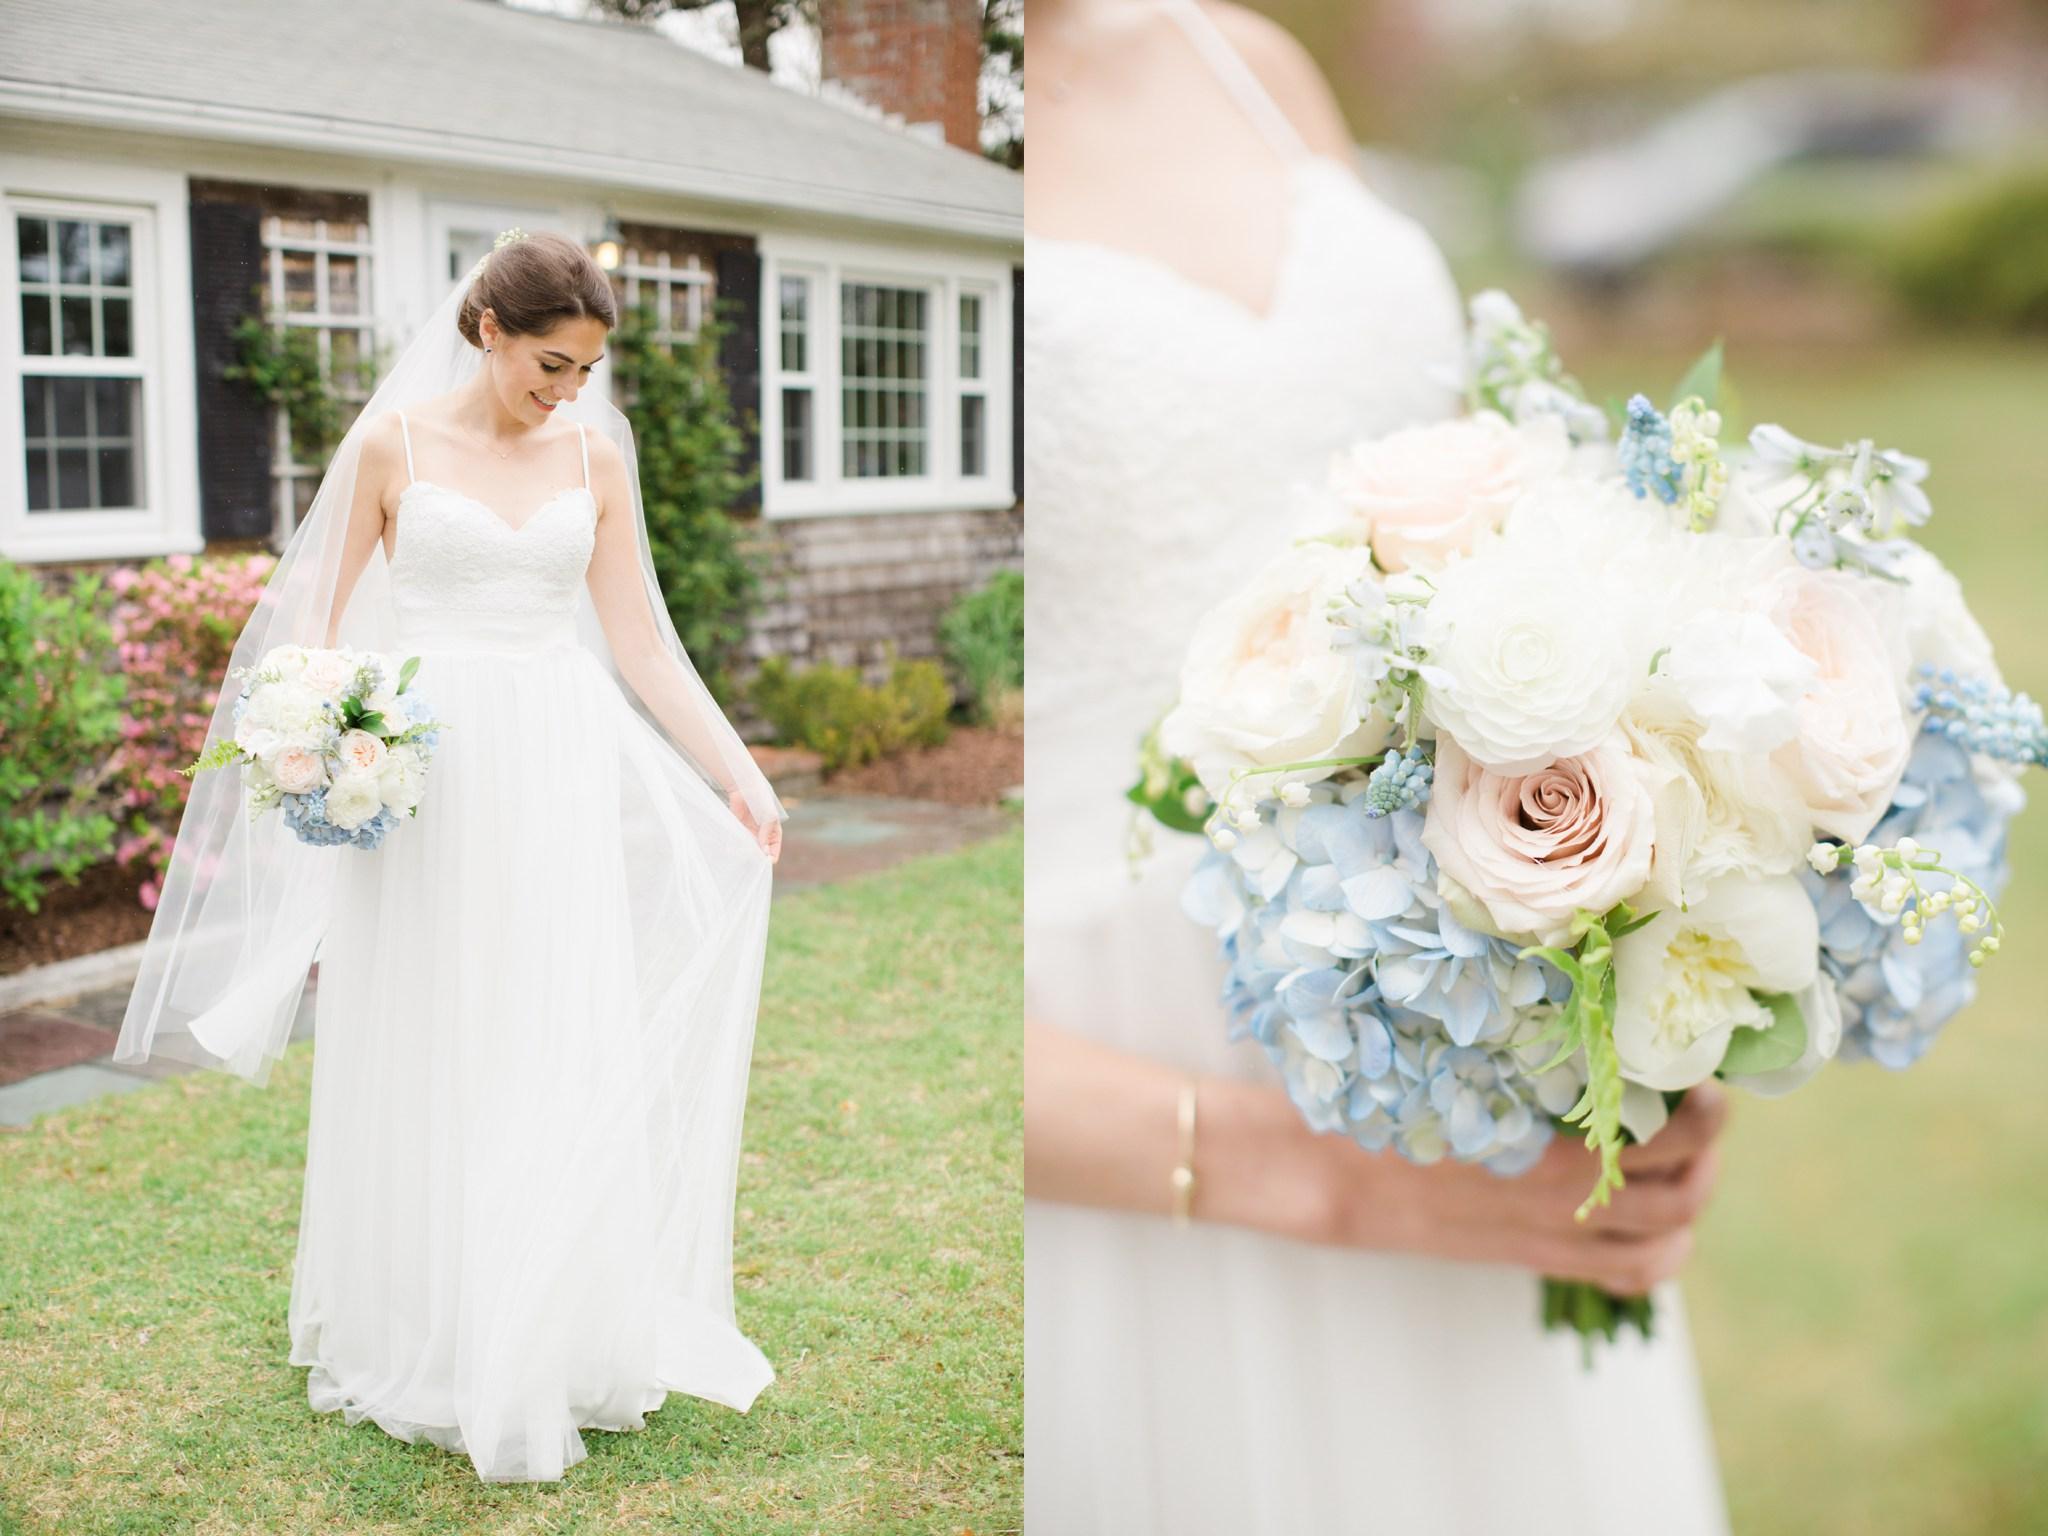 cape_cod_wedding_deborah_zoe_Photography_00022.JPG